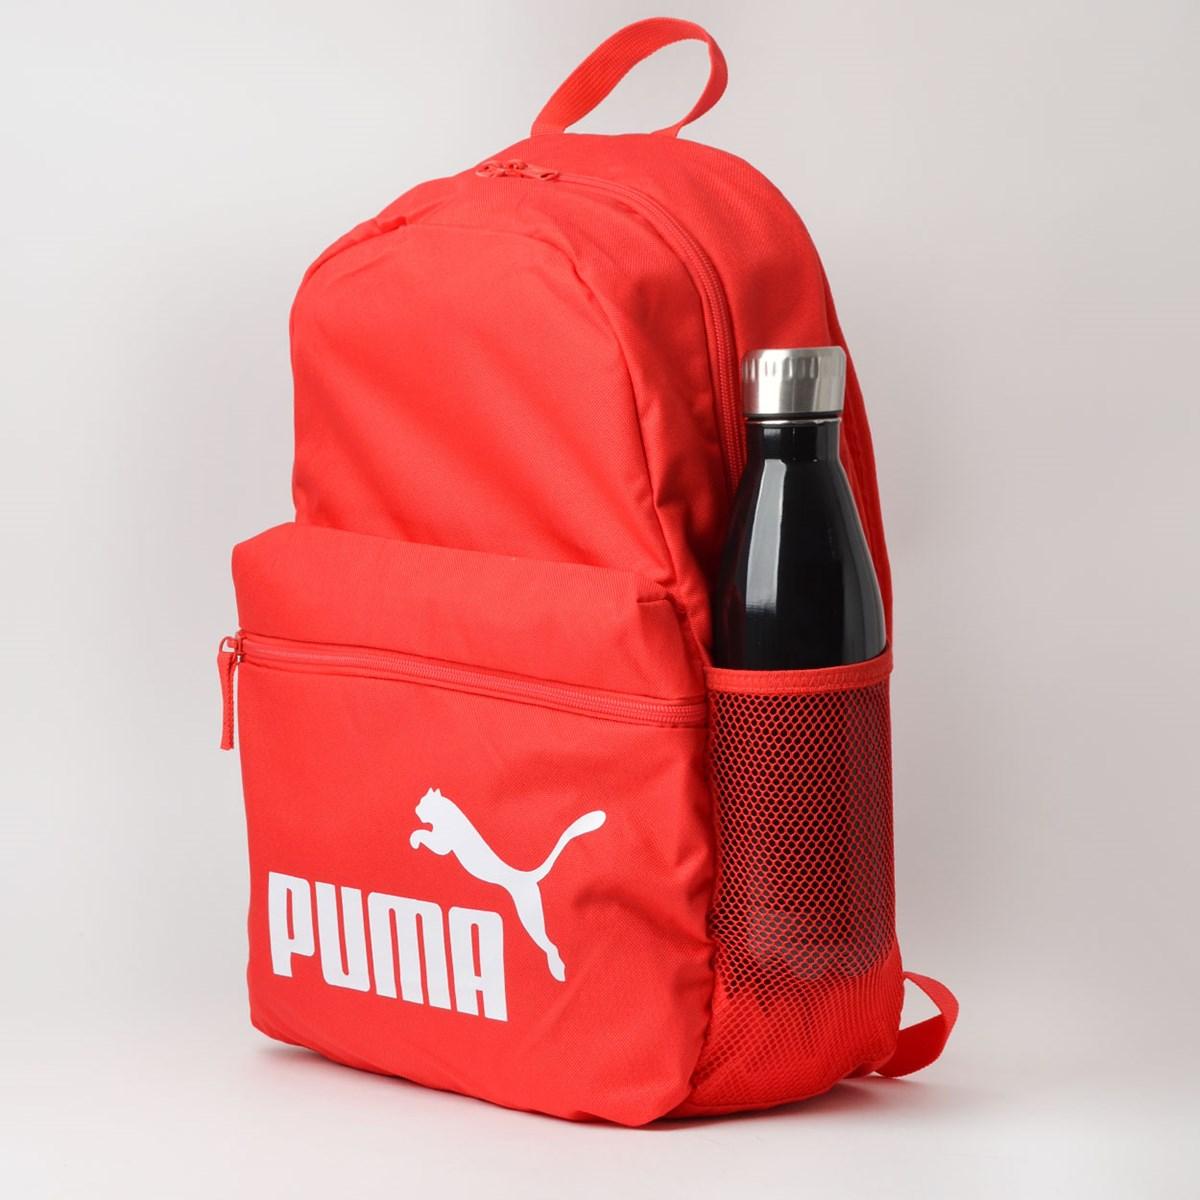 Mochila Puma Phase Backpack Vermelho 07548733